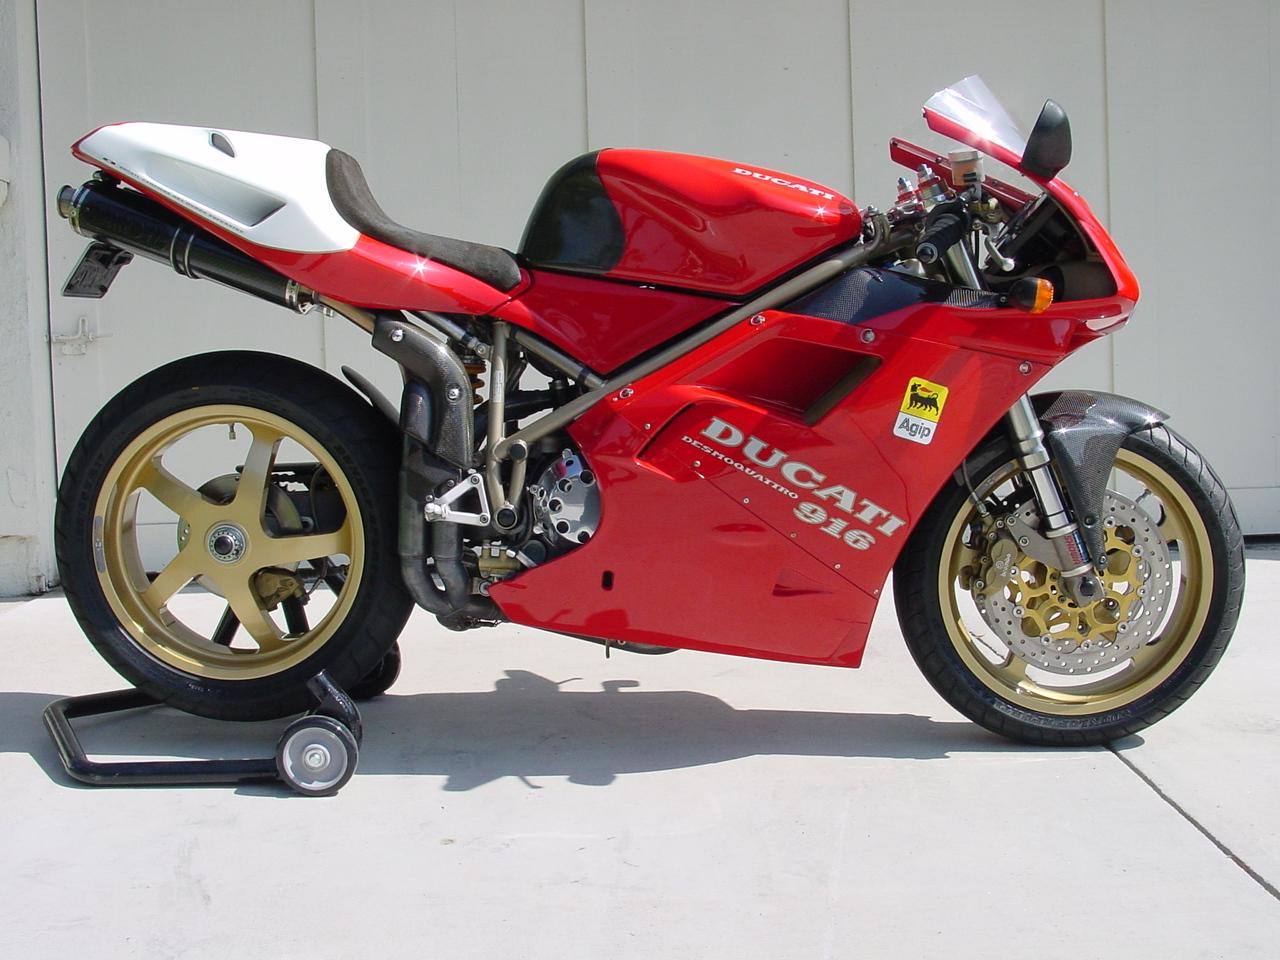 Ducati 916 credit Ducati